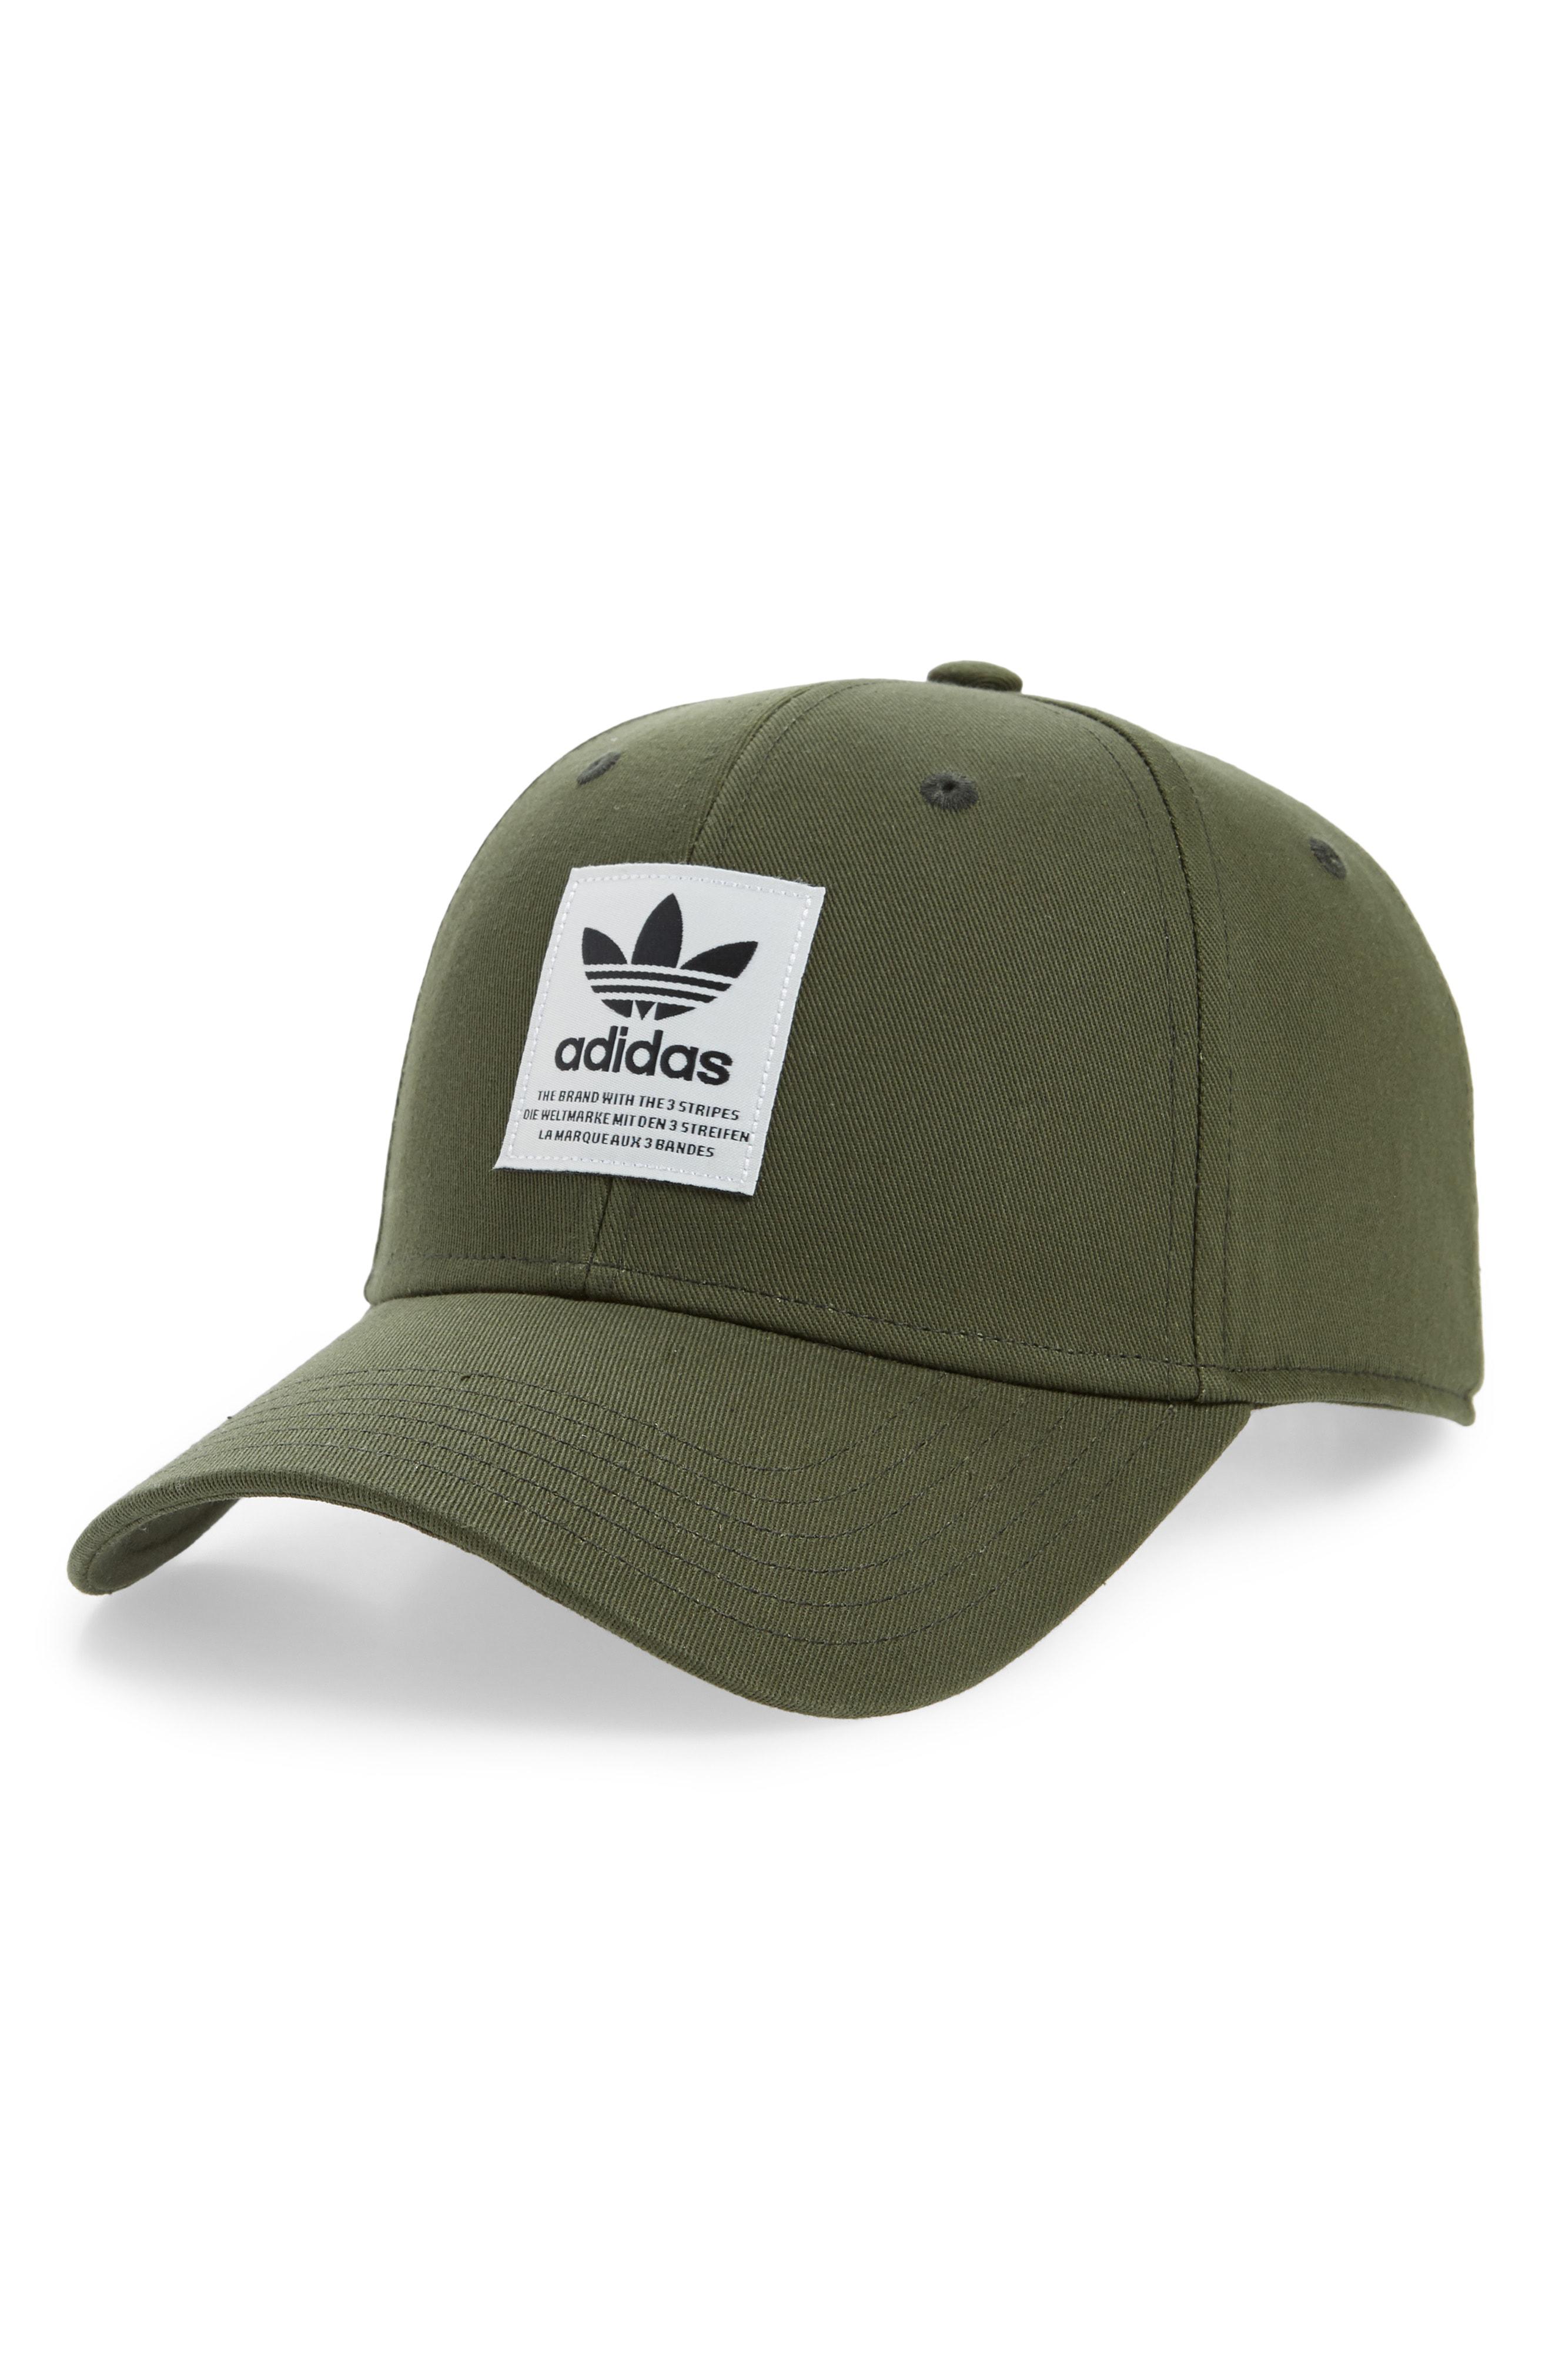 6caf22ca06d Adidas Originals Patch Baseball Cap - Green In Night Cargo  Off White  Black